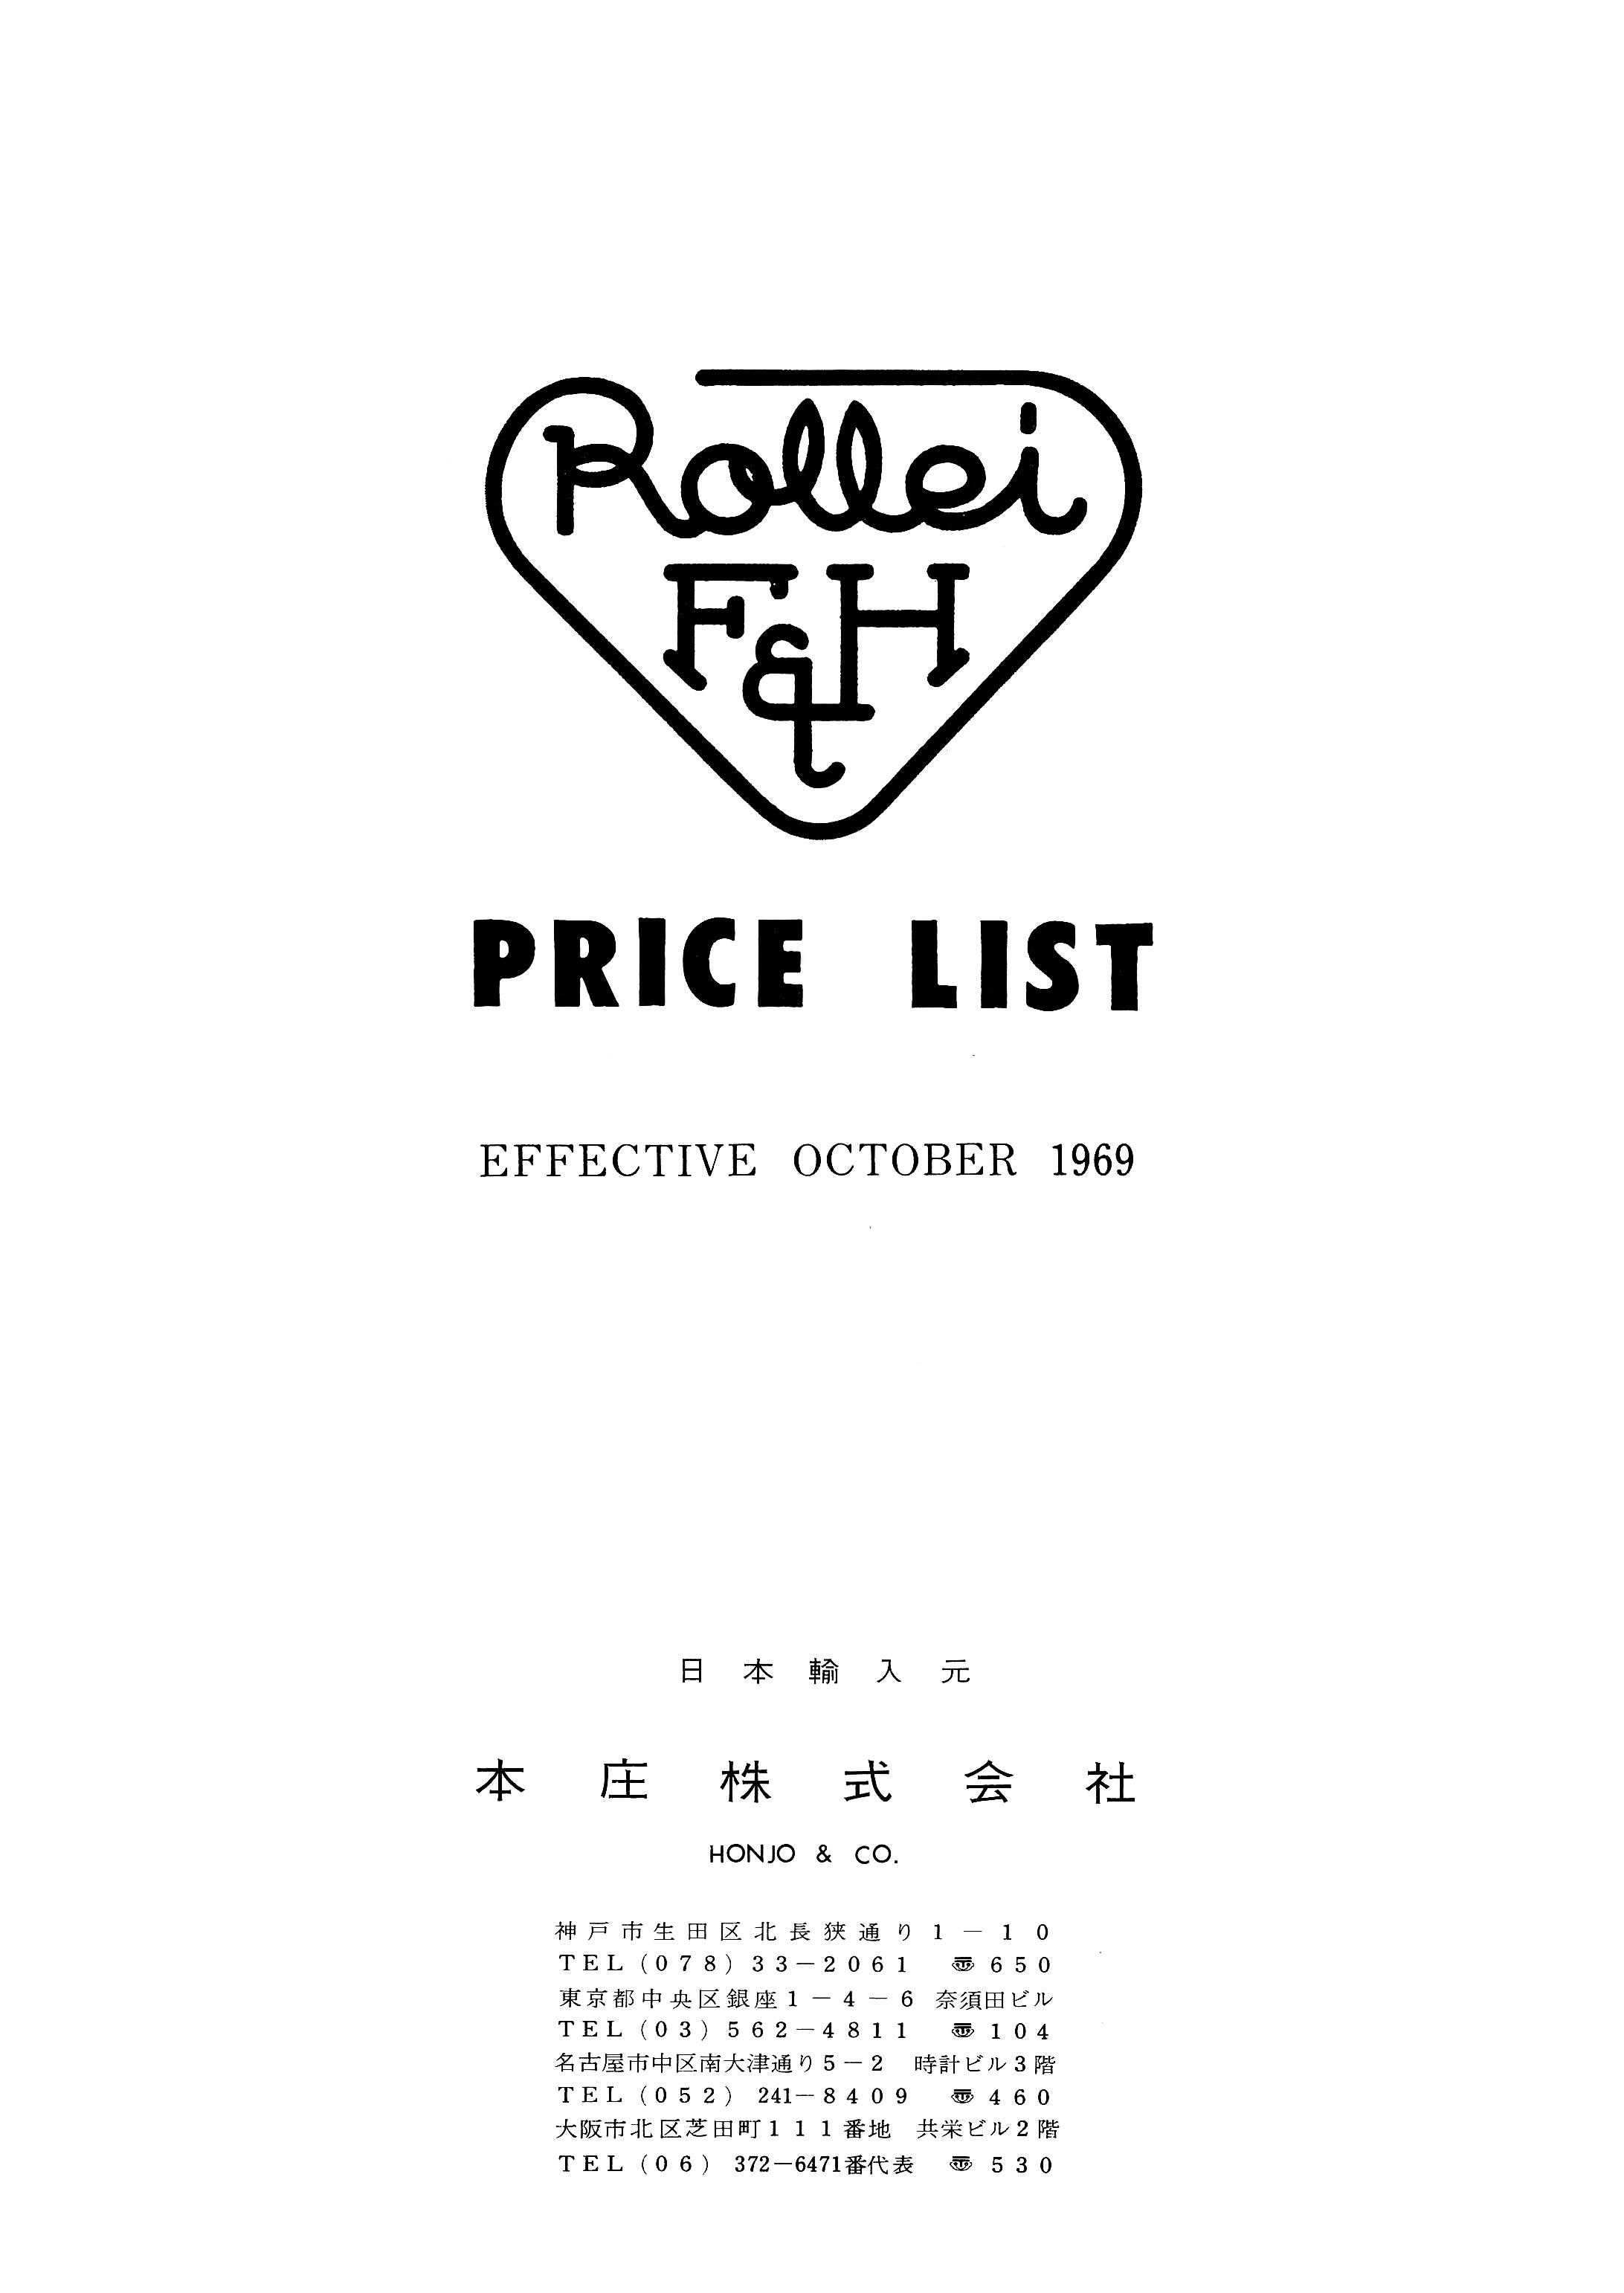 006_RollePRICELISToct.1969_01